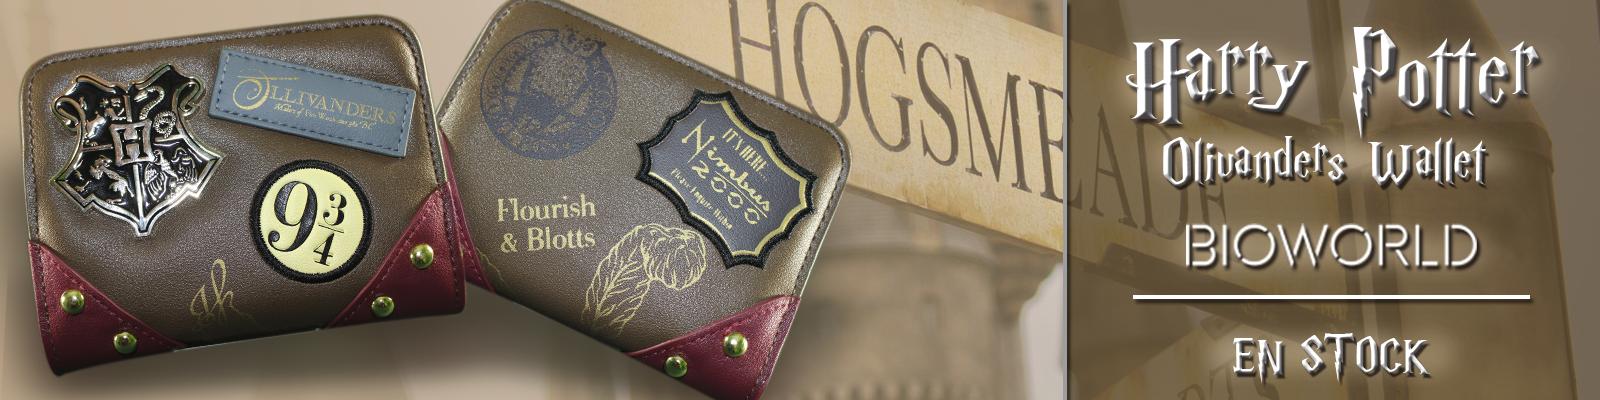 Harry_Potter_Wallet